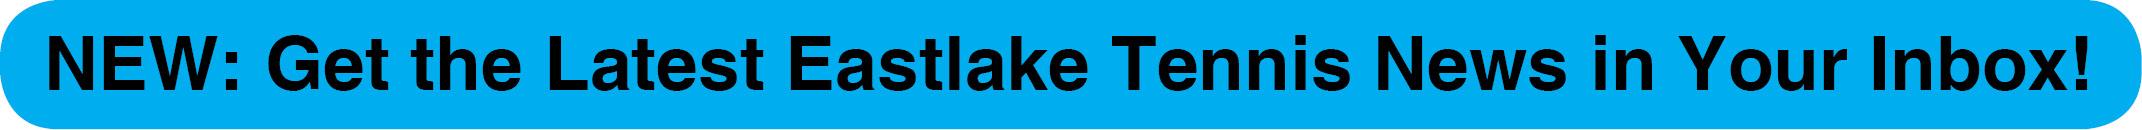 eastlake-tennis-web-image